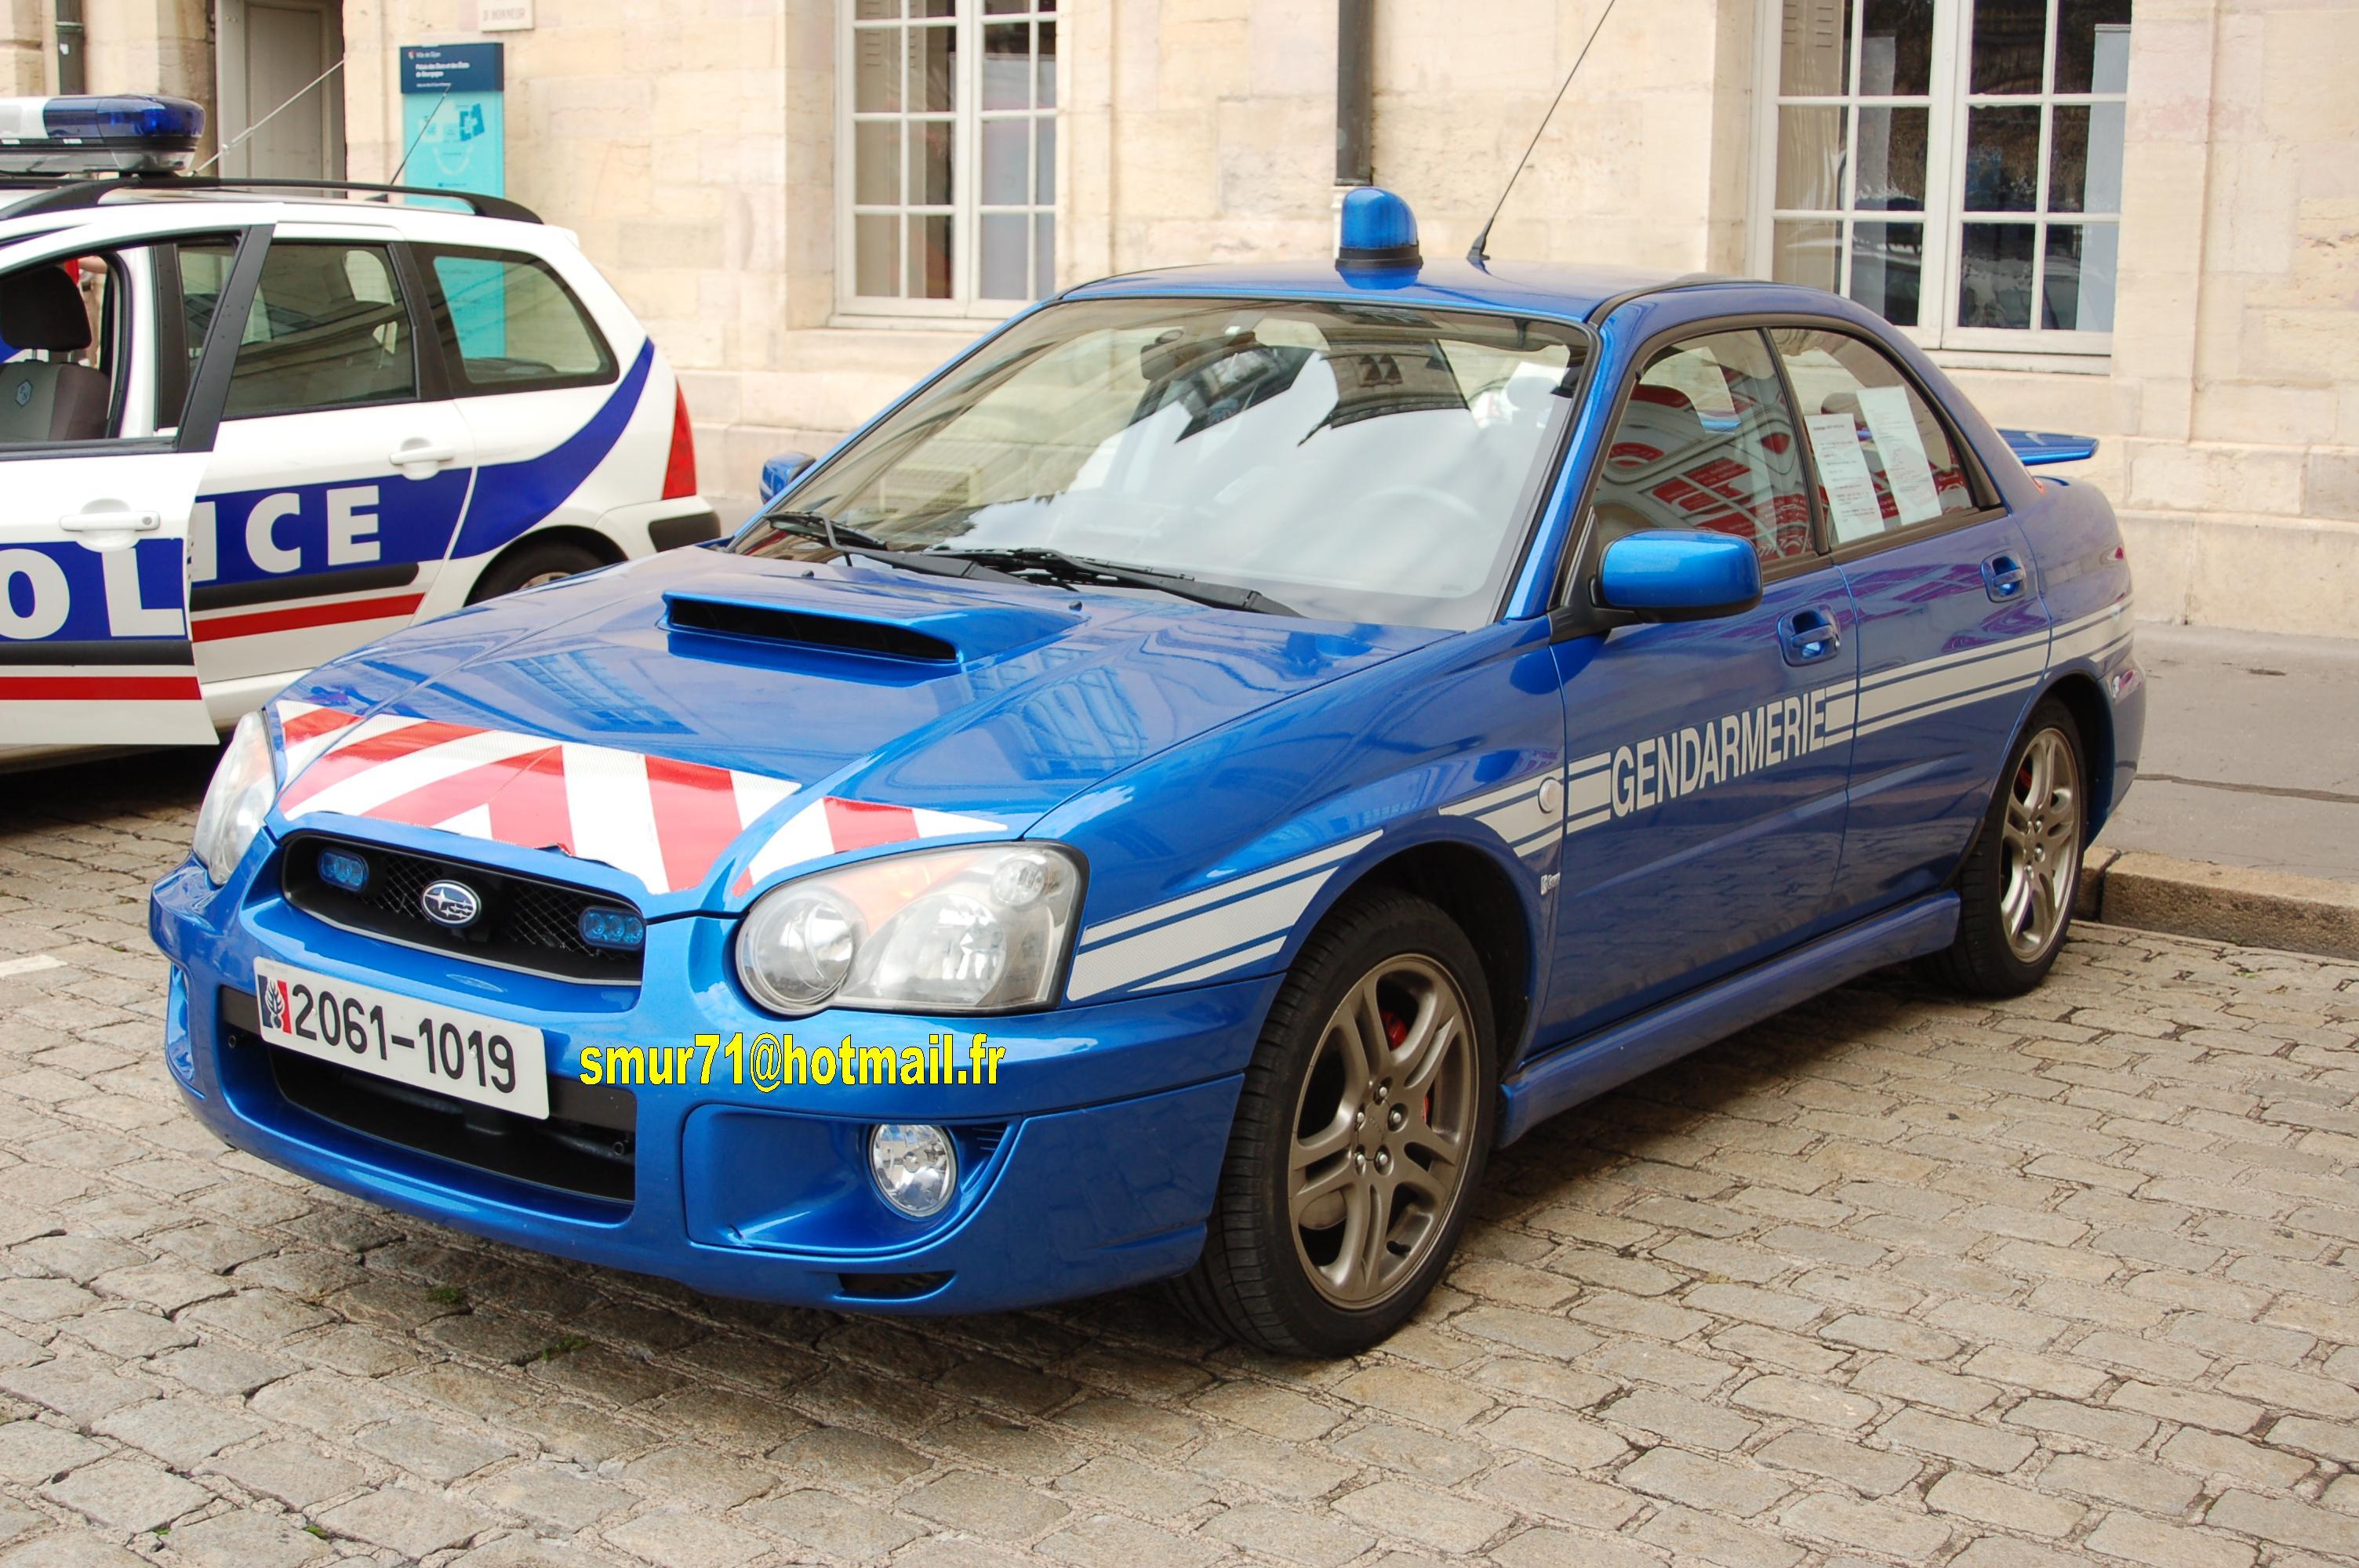 Garage ford dijon dimension garage ford dijon louer voiture pas cher dijon nissan sad dijon - Garage voiture occasion dijon ...